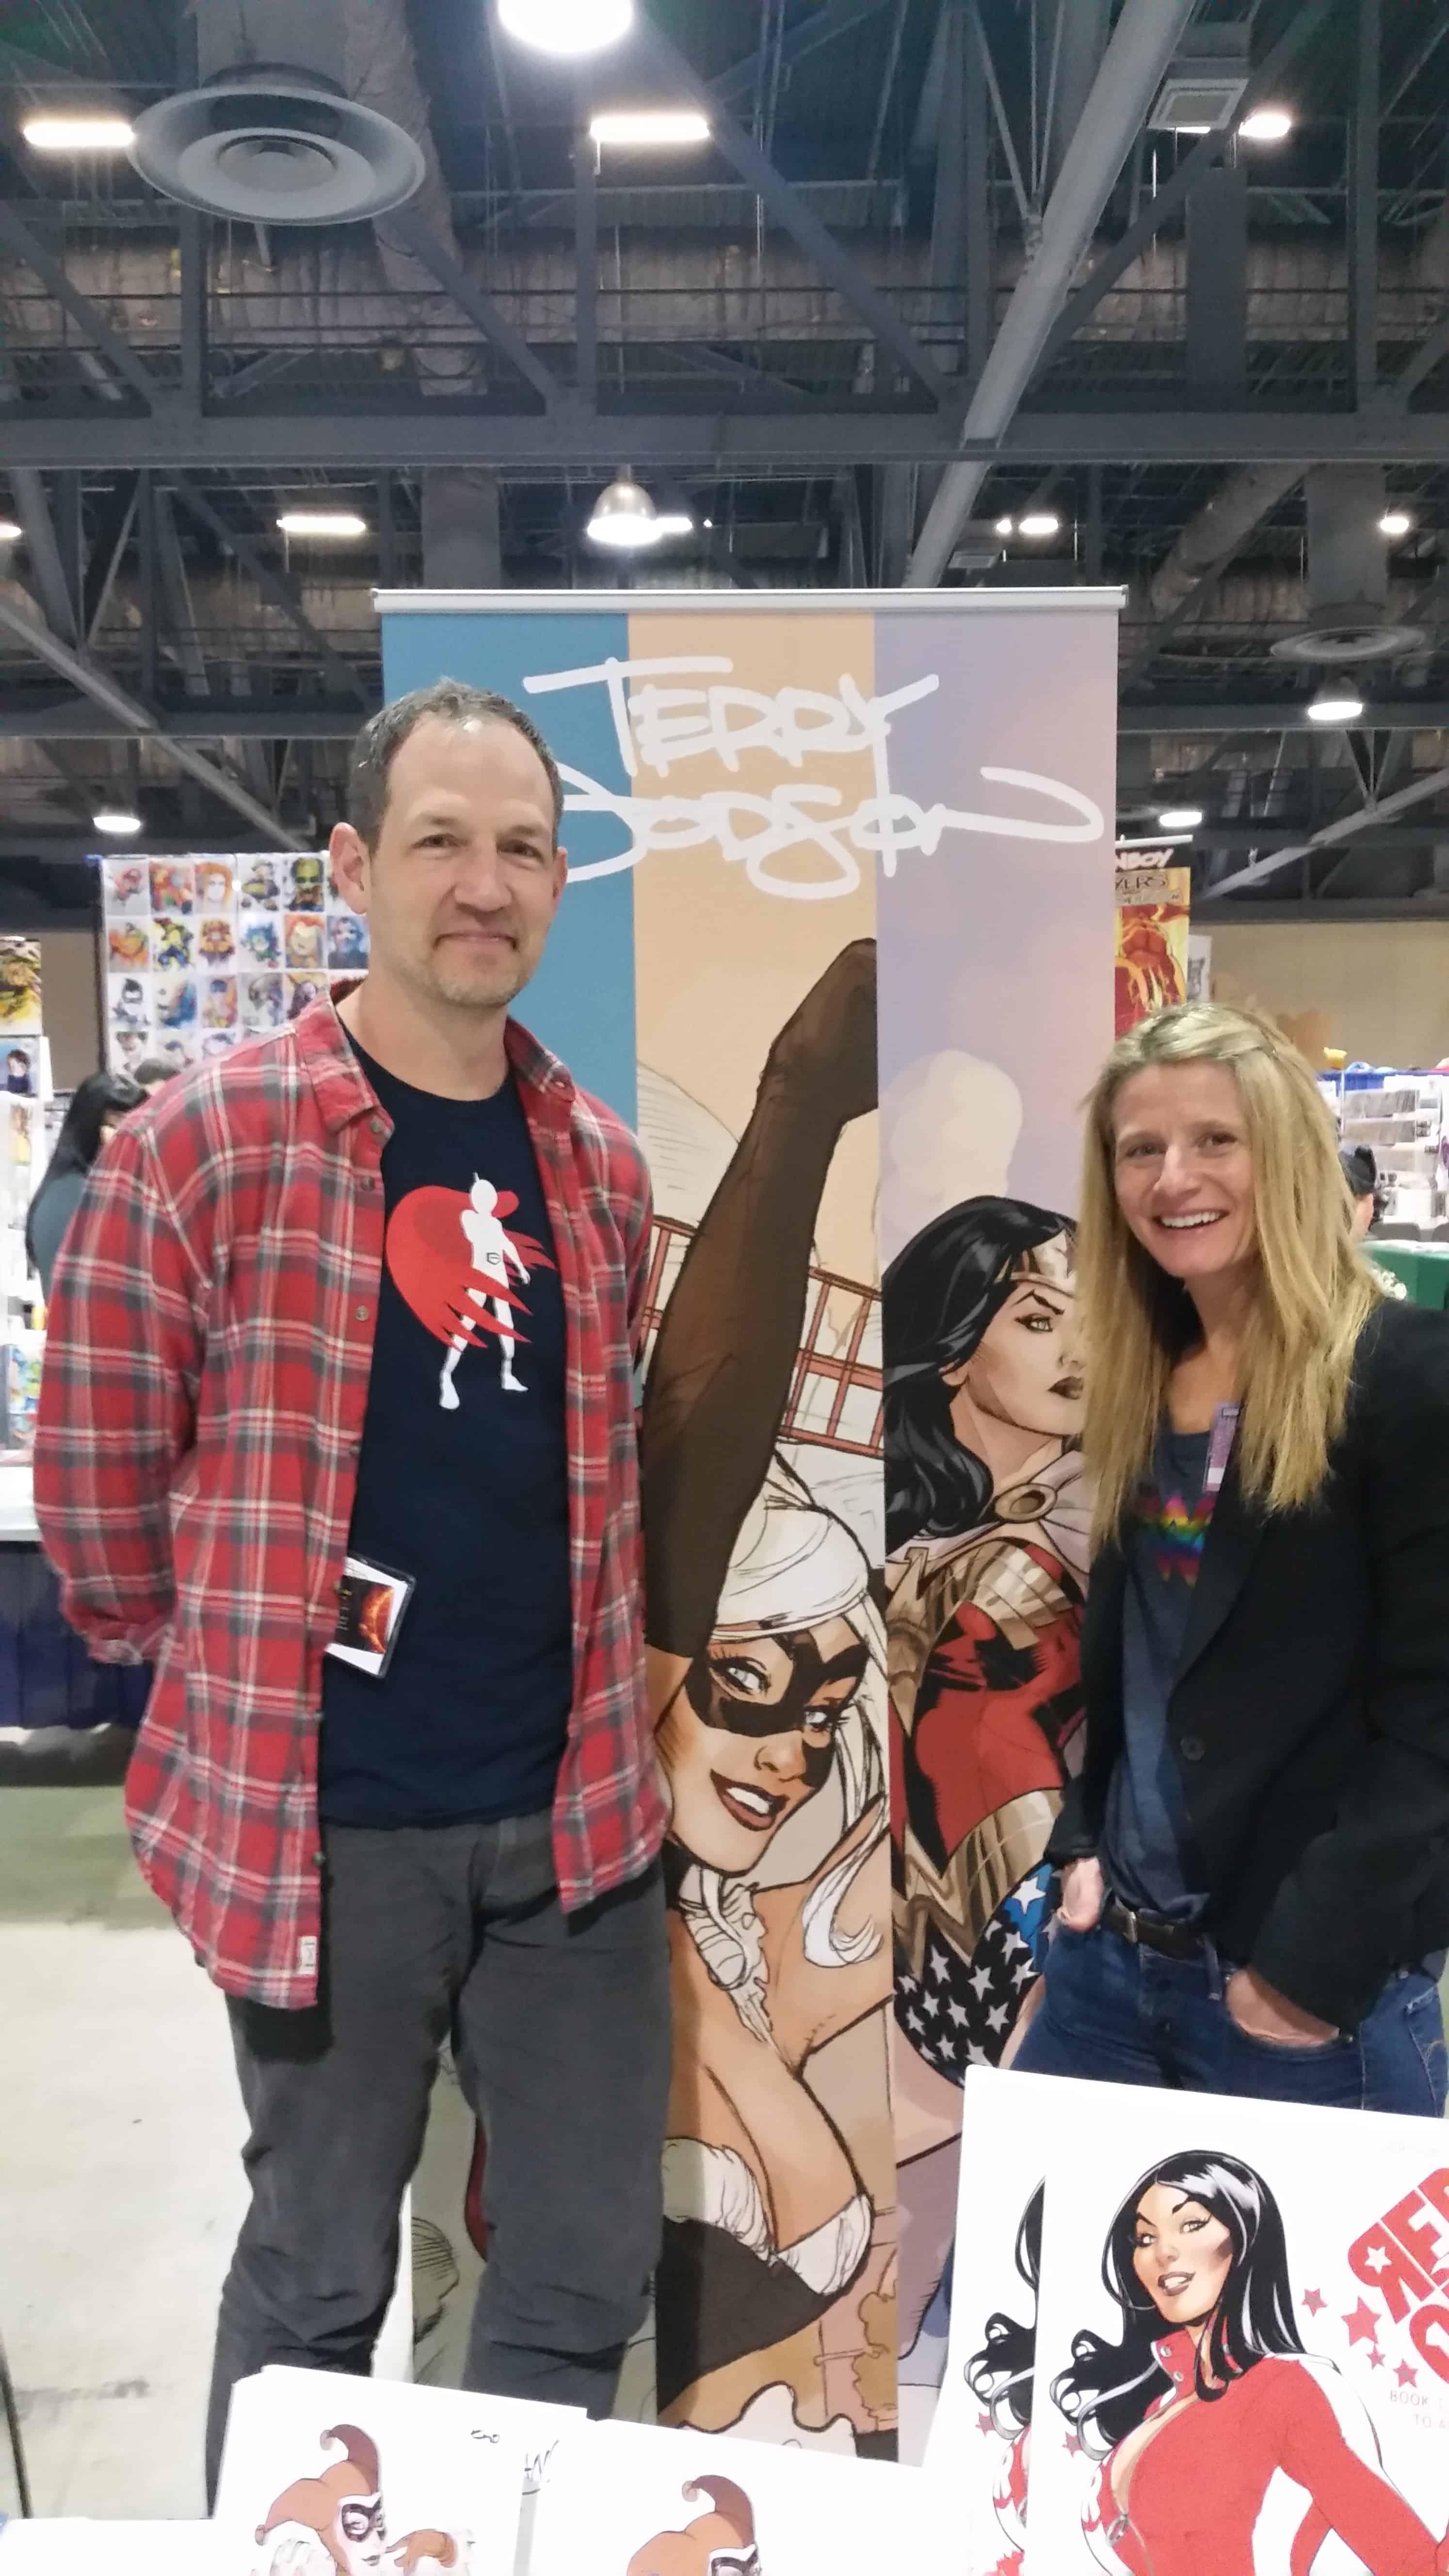 Terry and Rachel Dodson 2016 Long Beach Comic Expo Media Coverage #LBCC